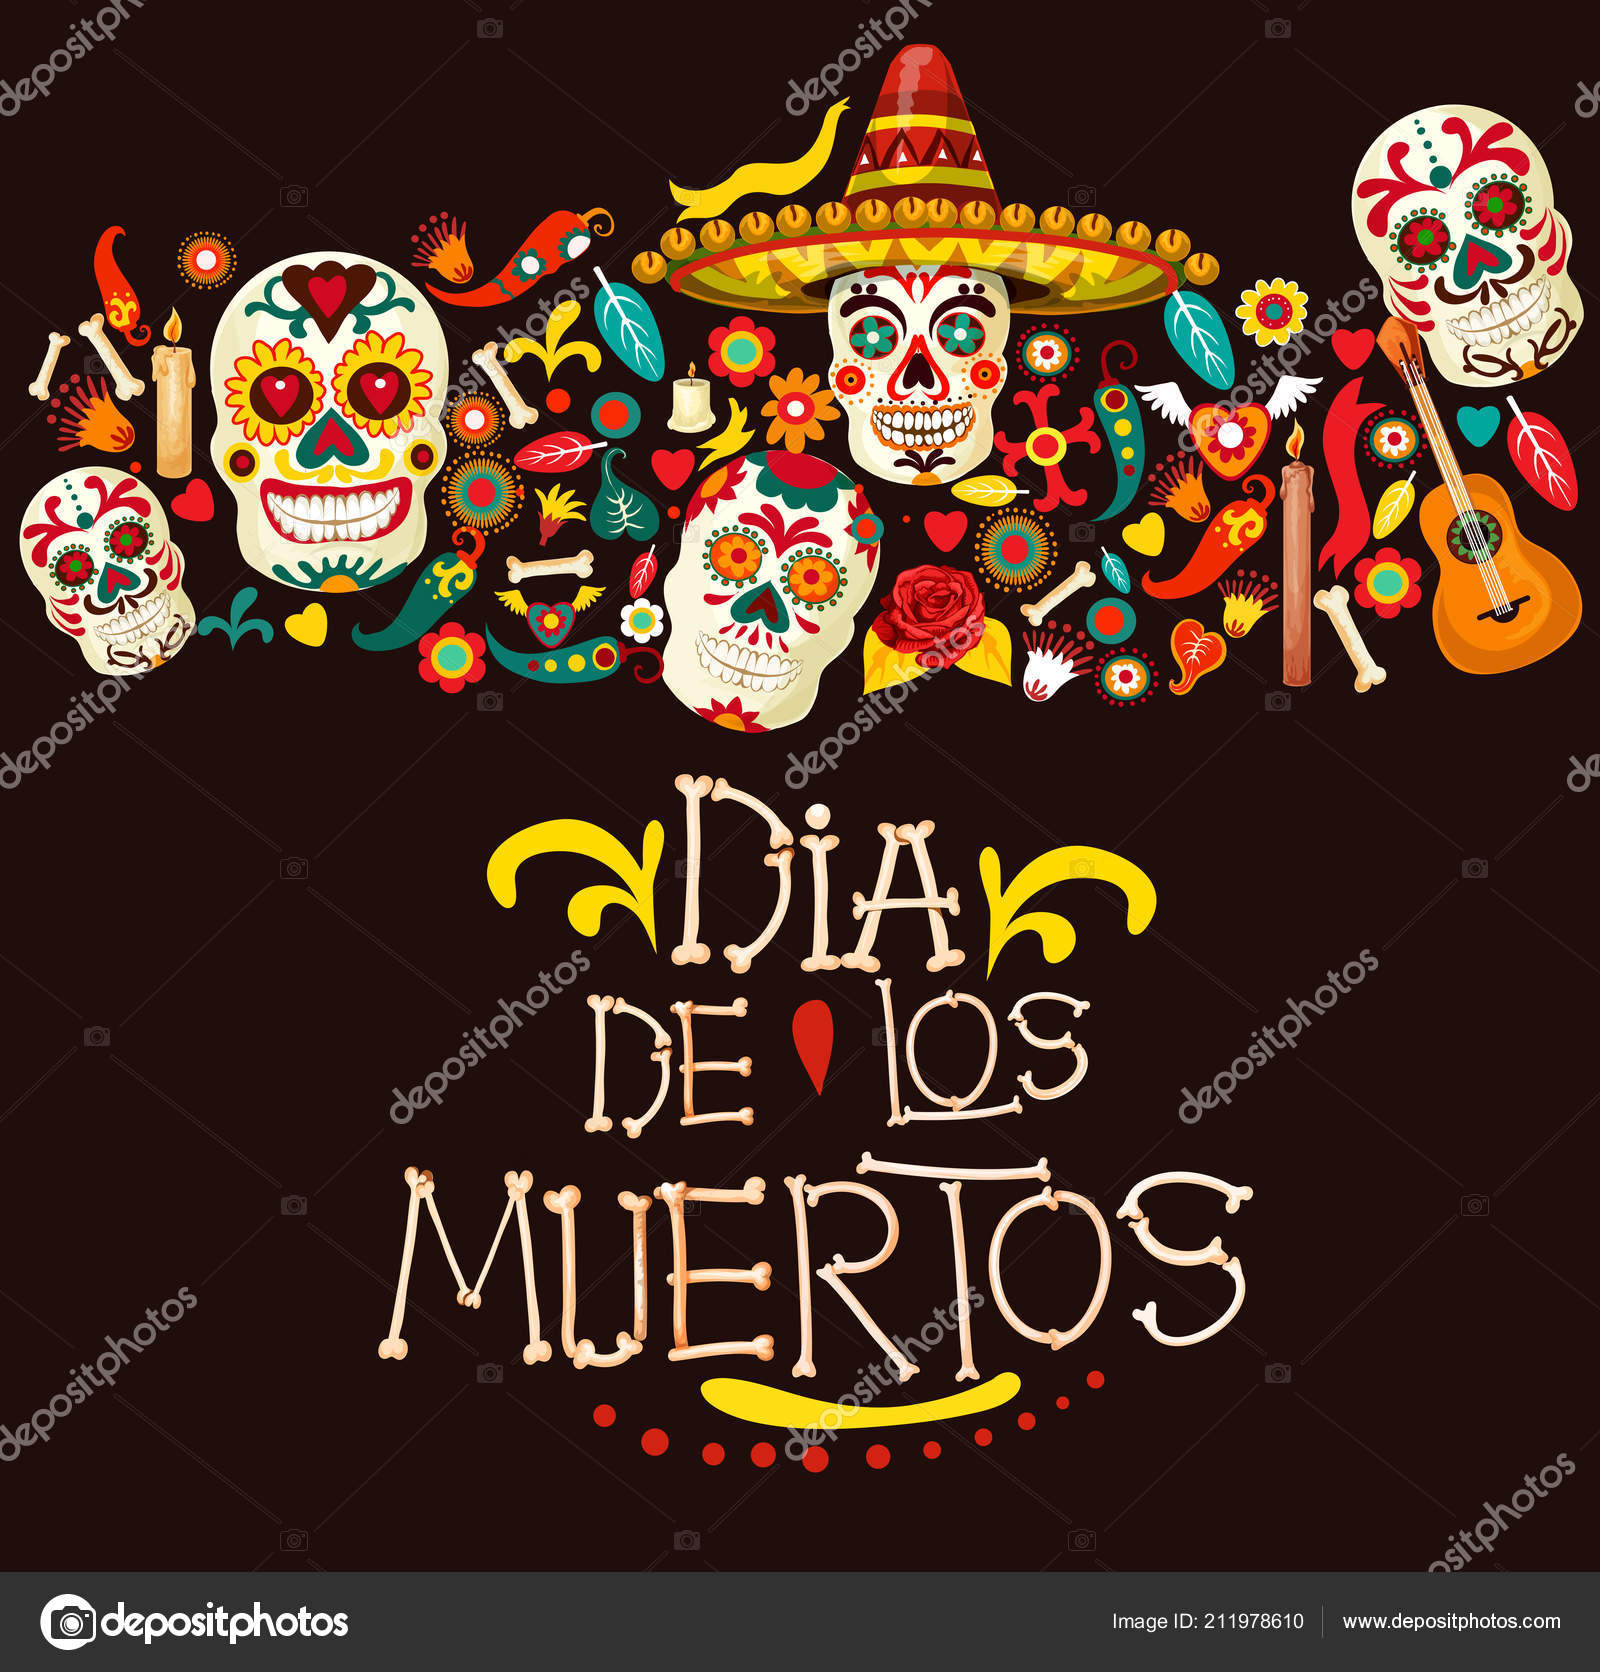 Dia de los muertos mexican holiday greeting card dia de los muertos greeting card for mexican traditional holiday or day of dead celebration vector cartoon skeleton skulls in sombrero with mexico m4hsunfo